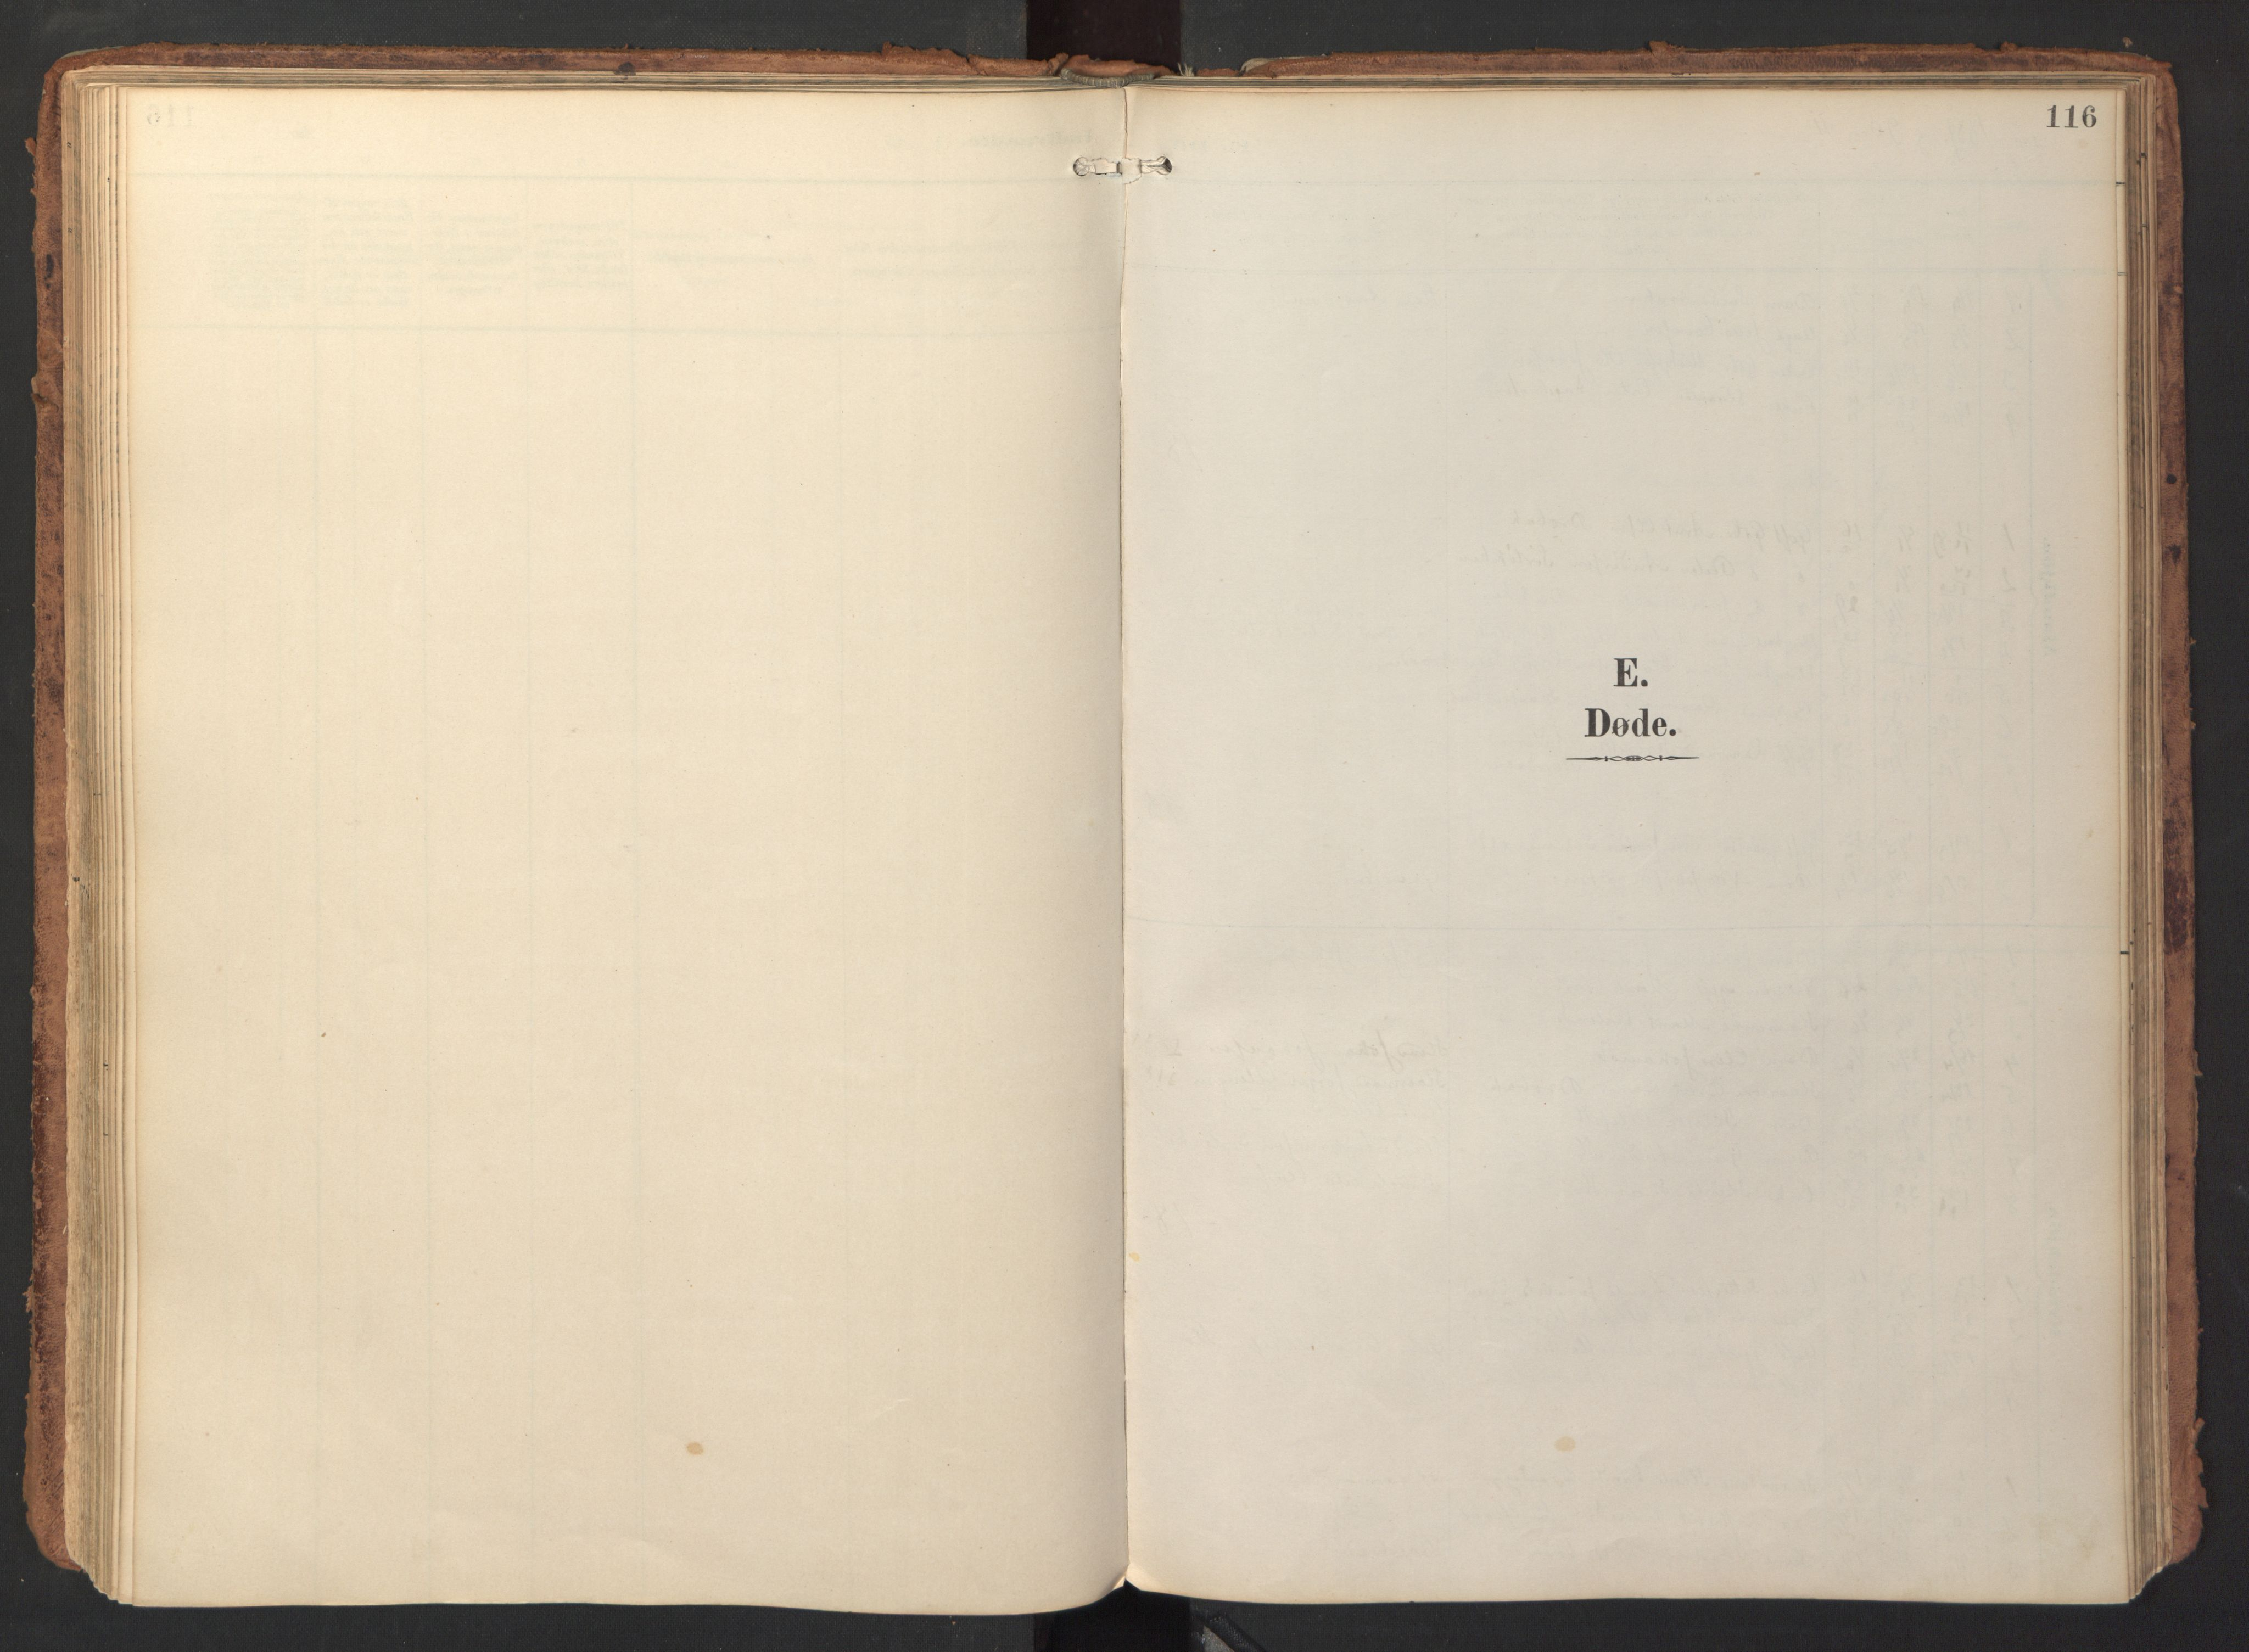 SAT, Ministerialprotokoller, klokkerbøker og fødselsregistre - Sør-Trøndelag, 690/L1050: Parish register (official) no. 690A01, 1889-1929, p. 116